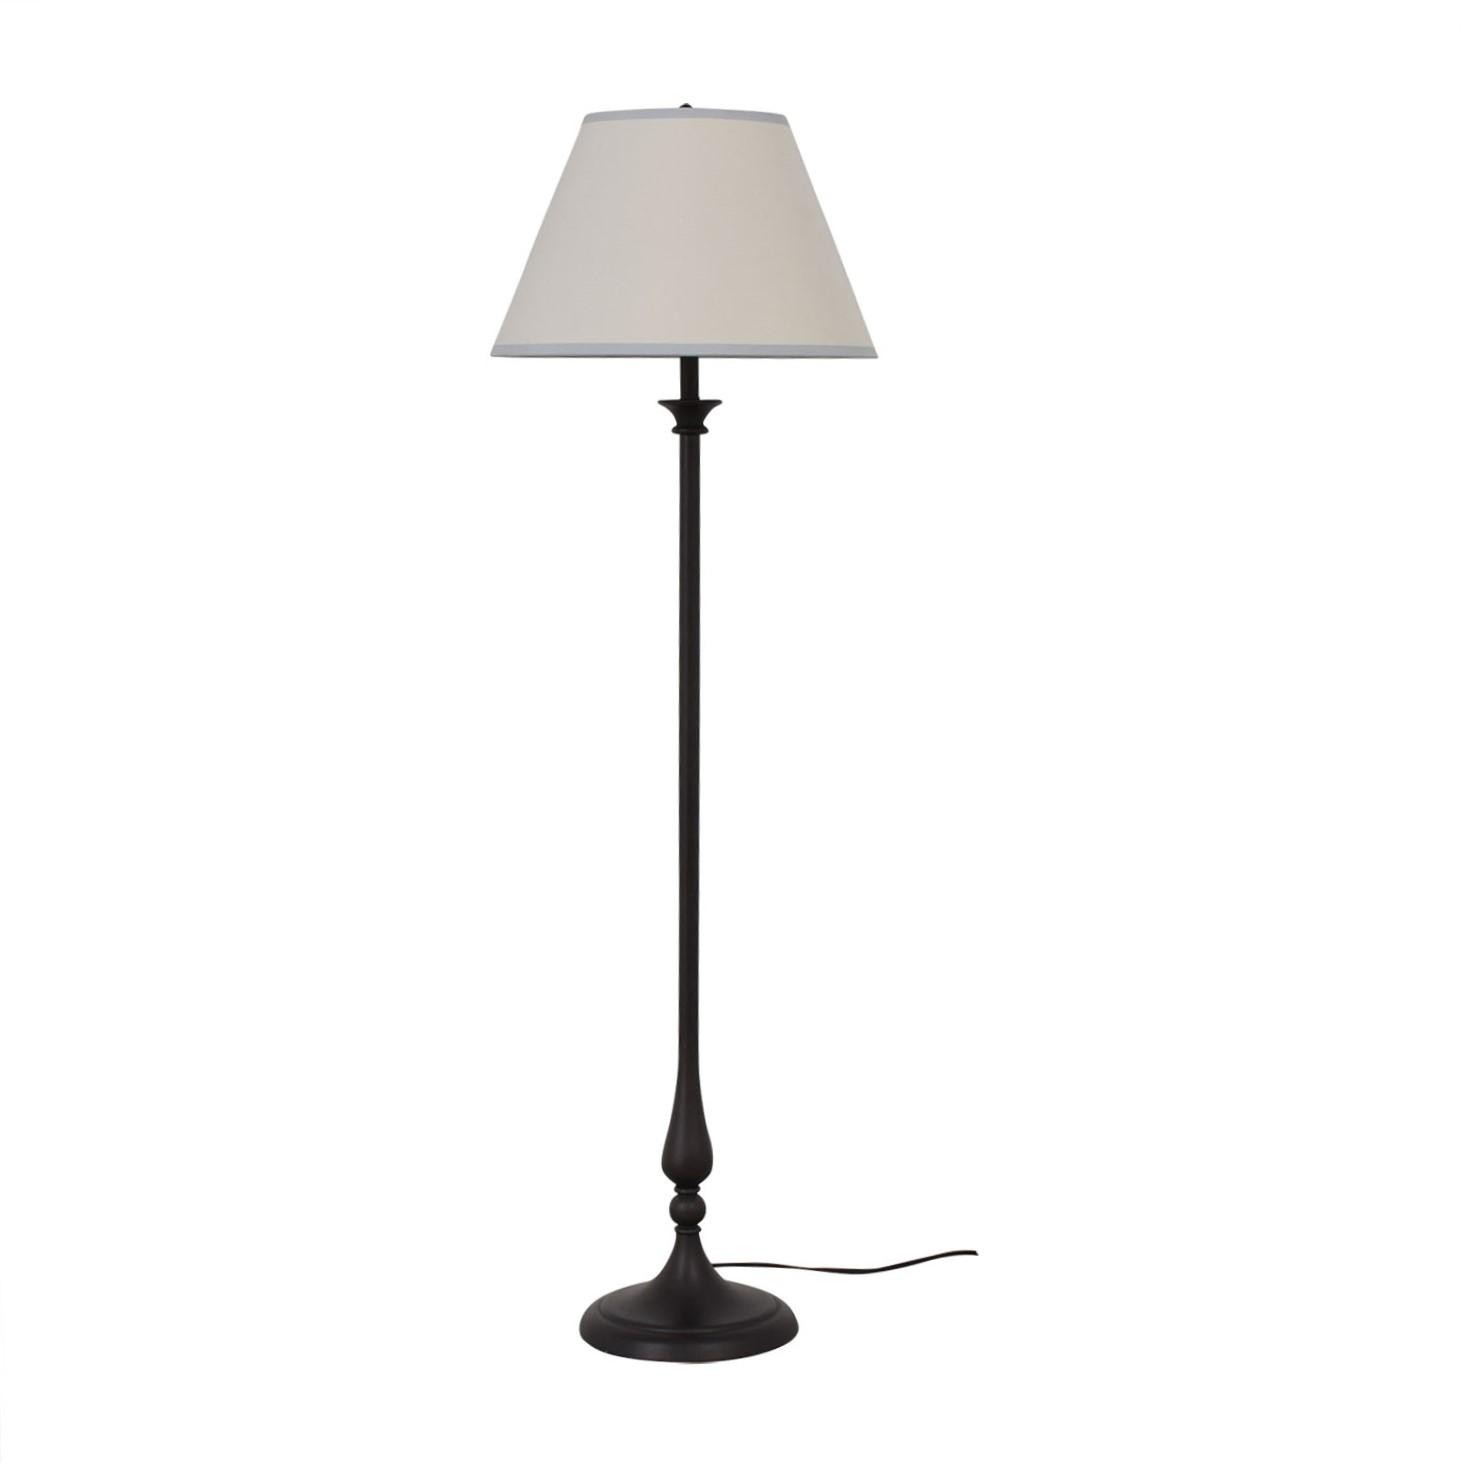 Pottery Barn Pottery Barn Floor Lamp on sale